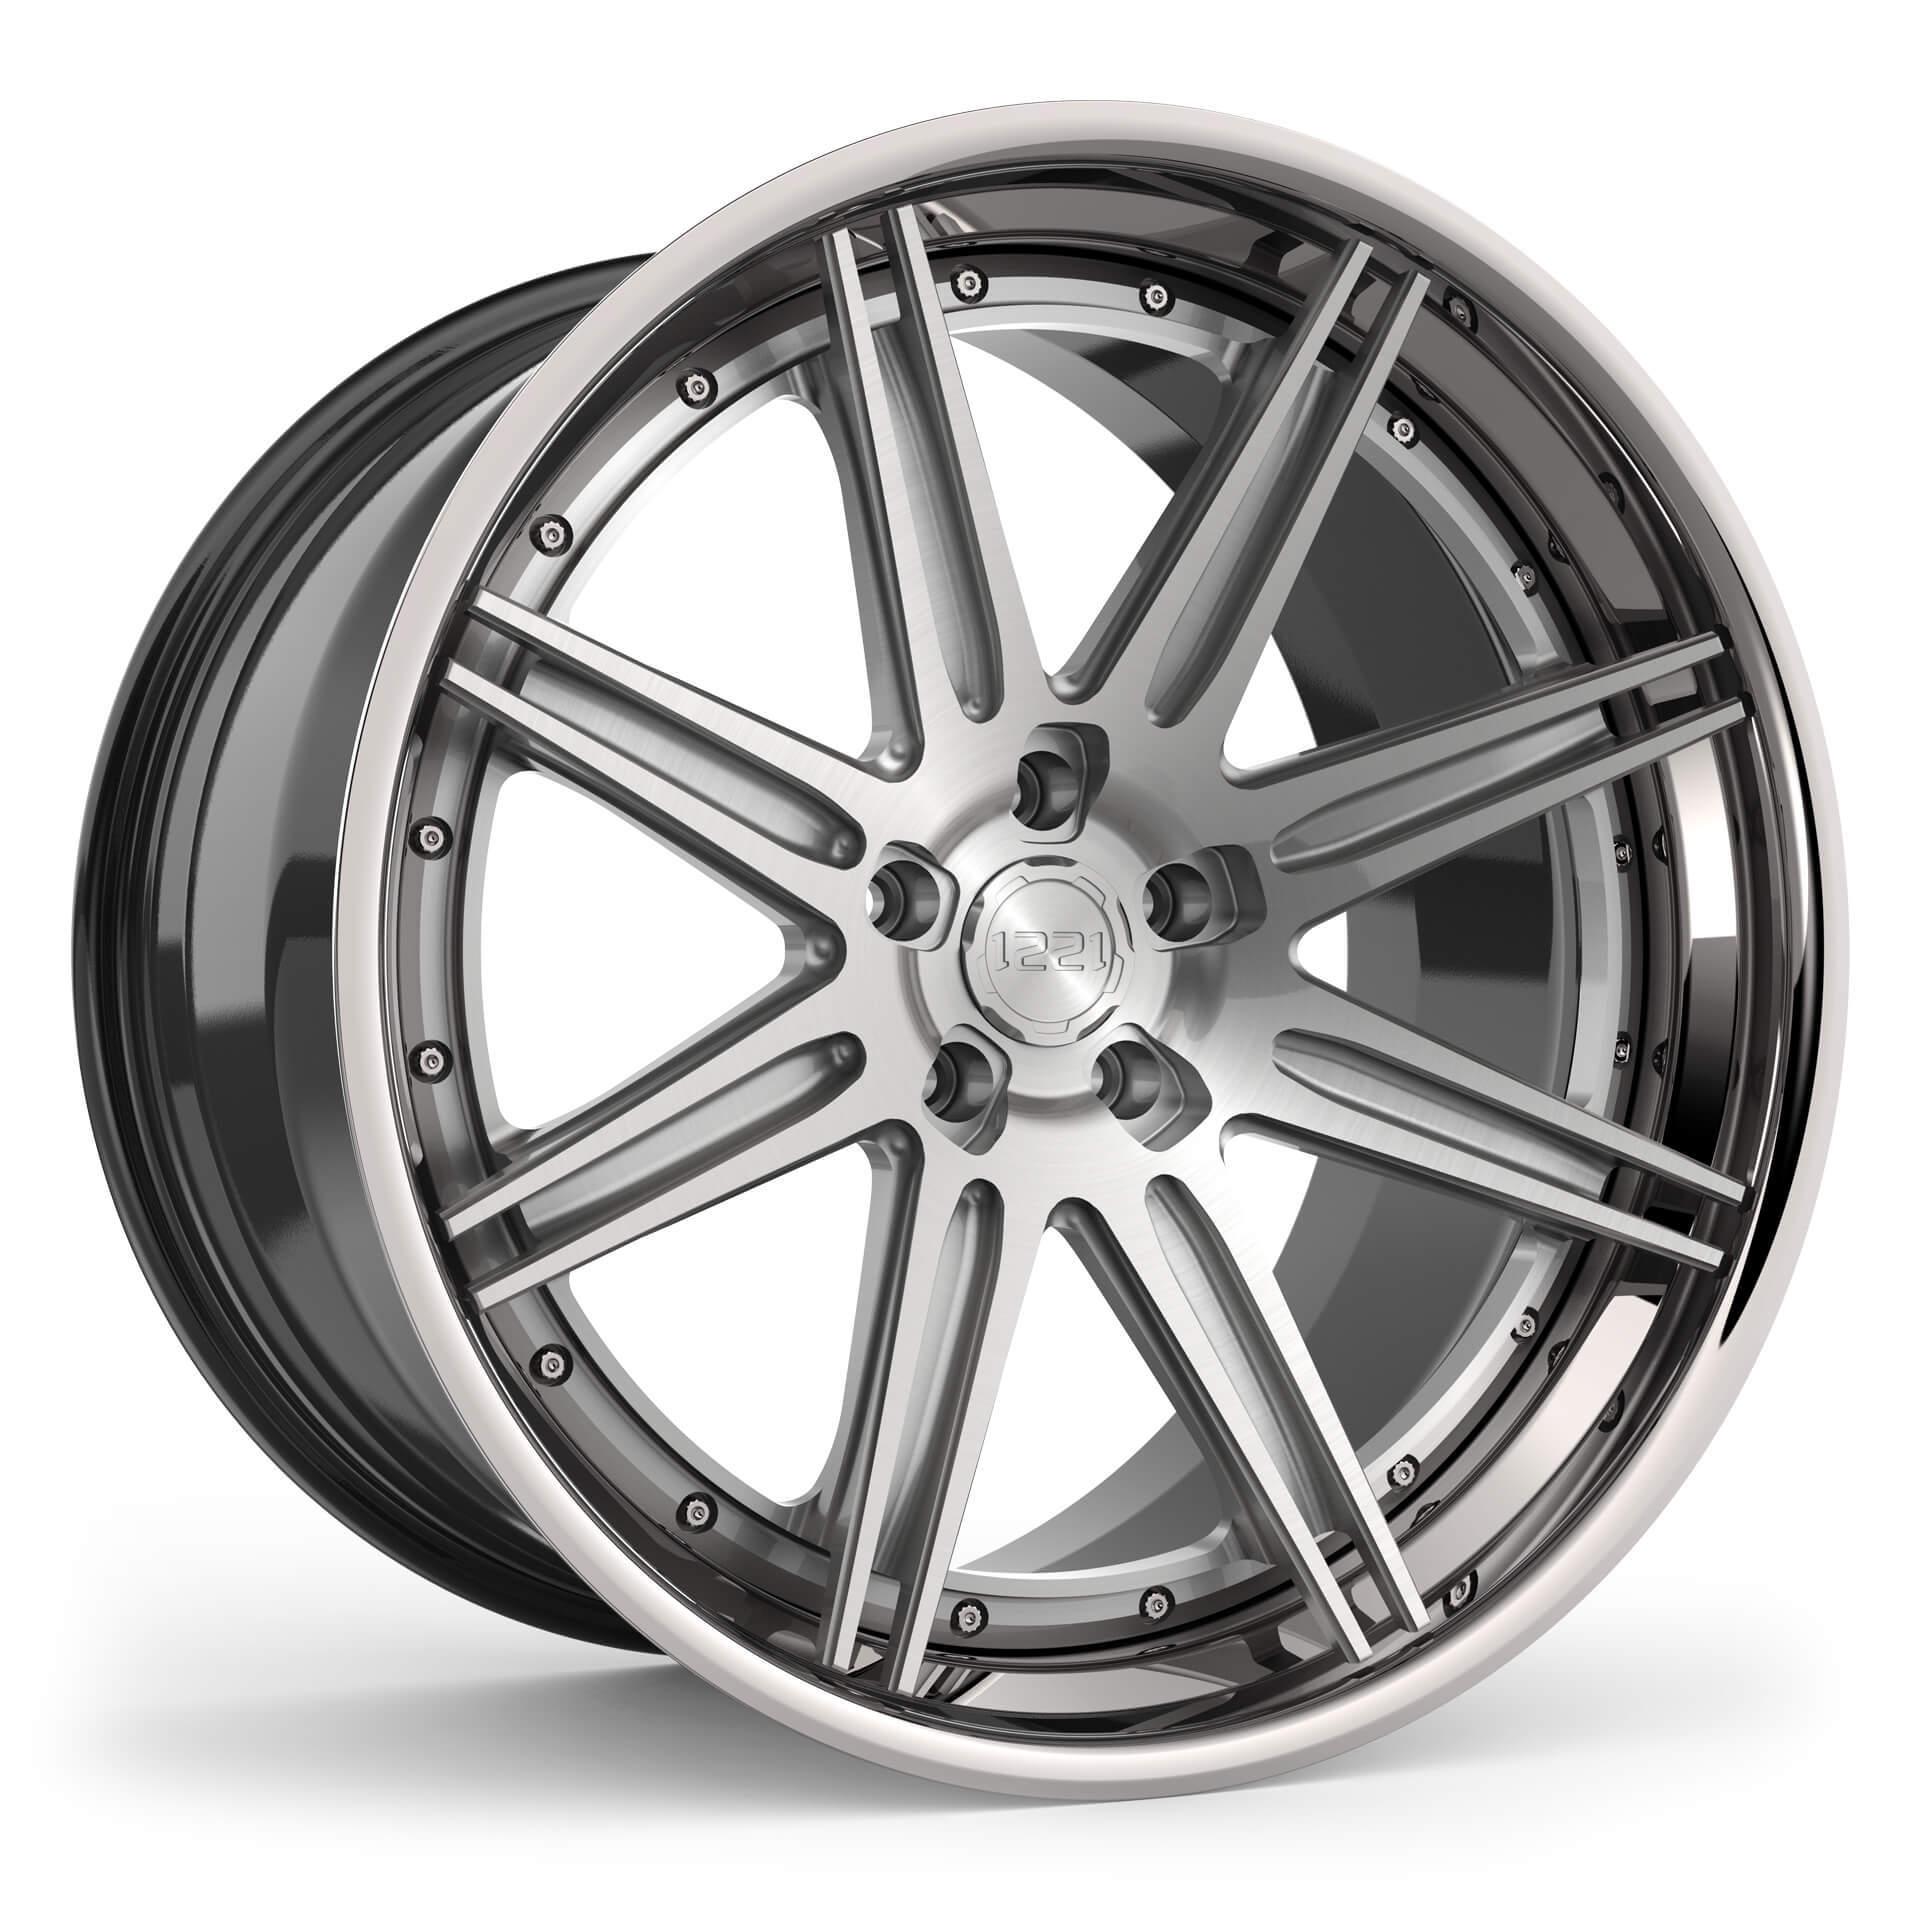 1221  Wheels 0880 AP3L SPORT3.0 forged wheels